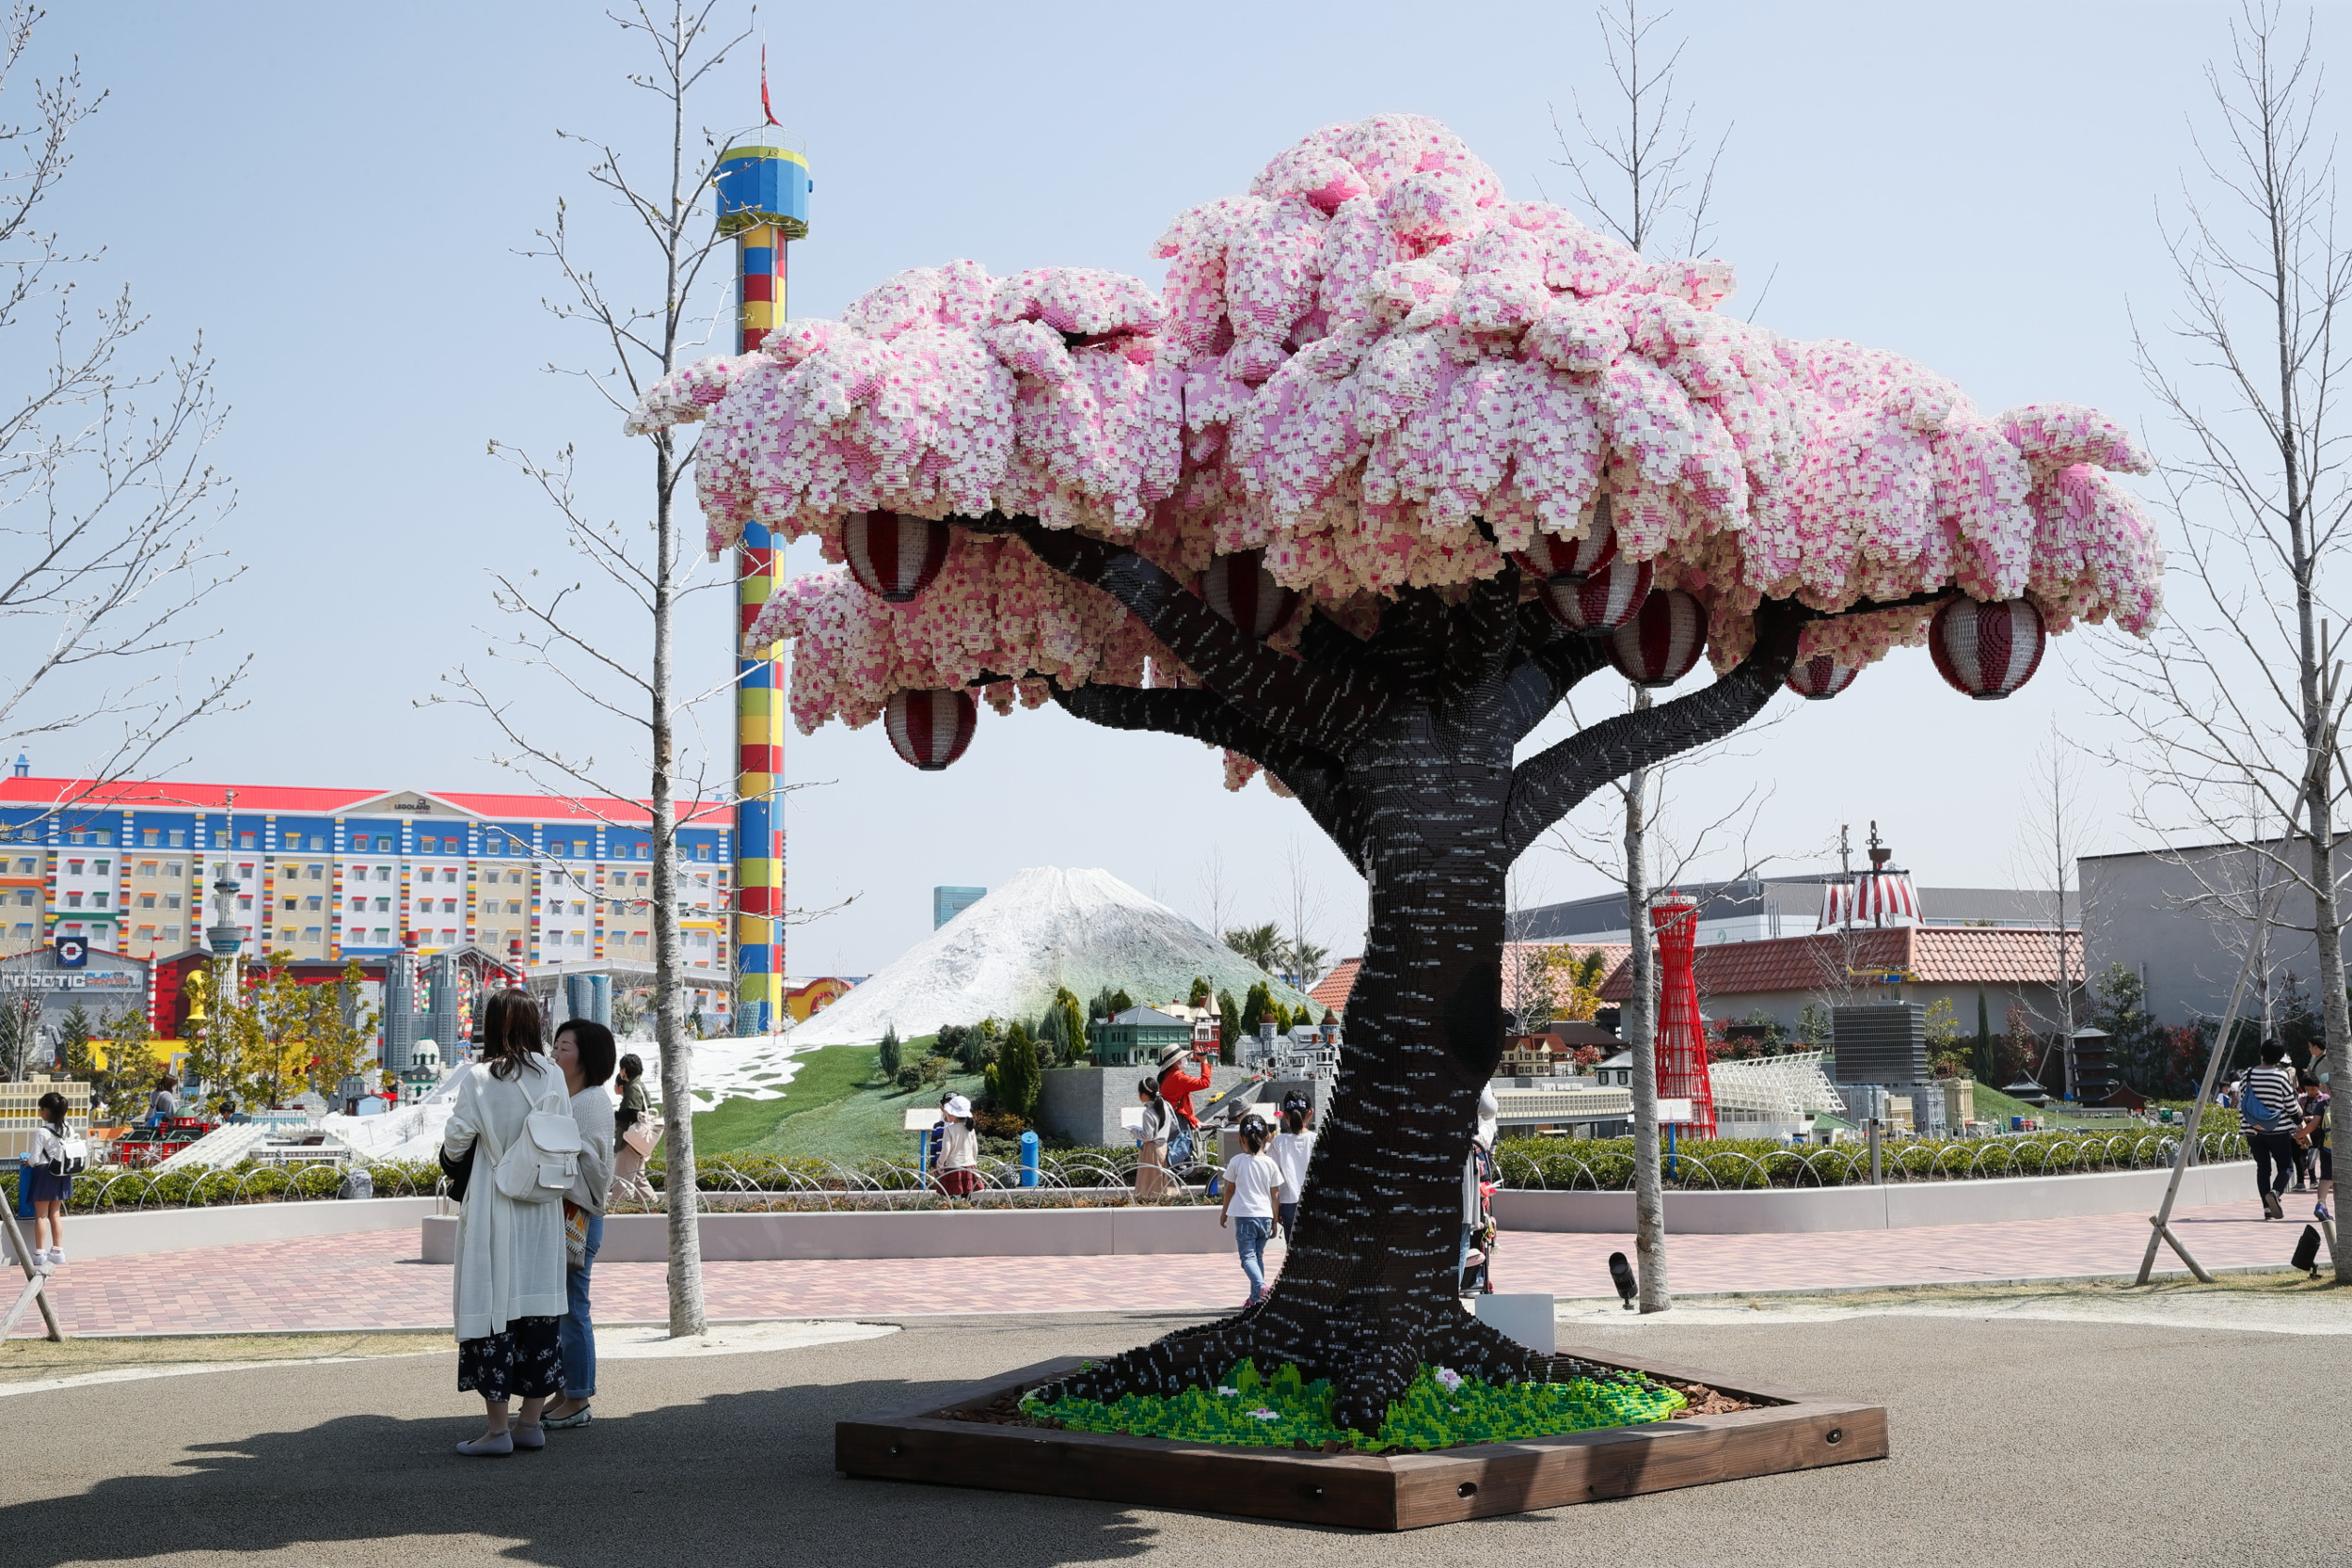 18 - 881,470 brick cherry blossom tree in LEGOLAND, Japan